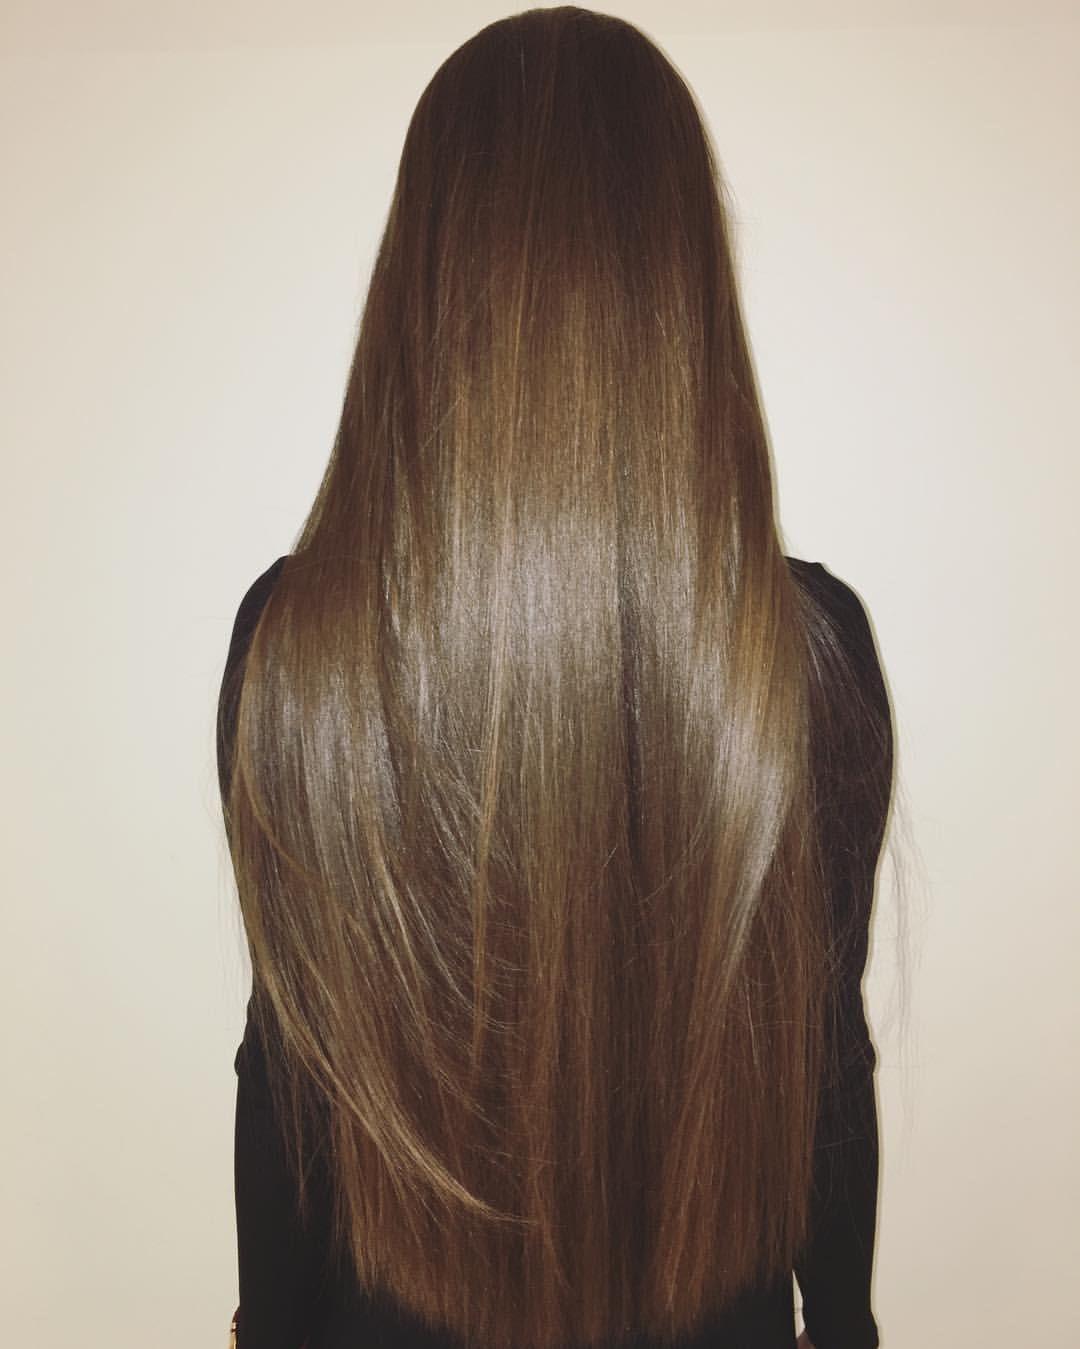 Snip Snip Fresh Haircut Straighthair Still Longhair Hairstyle So Soft Mane Fell Radiance Longhairdontcare Long Hair Styles Hair Styles Long Straight Hair